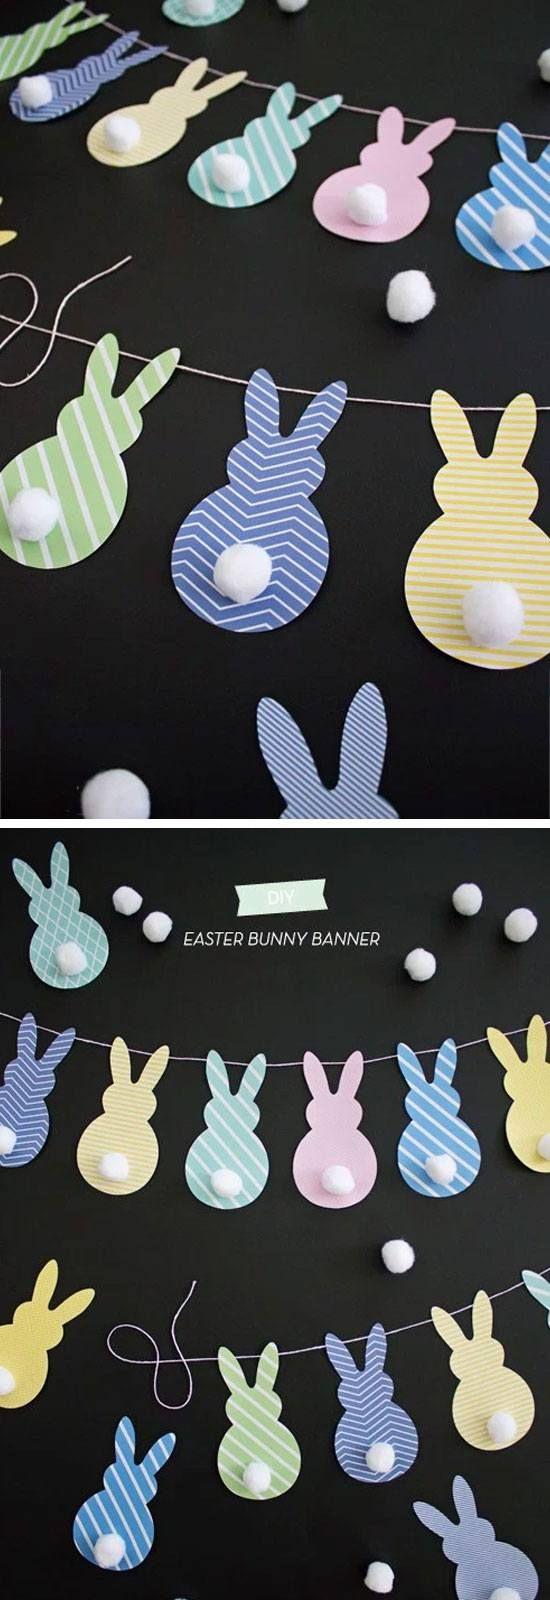 best easterspring ideas images on pinterest kitchens rabbit